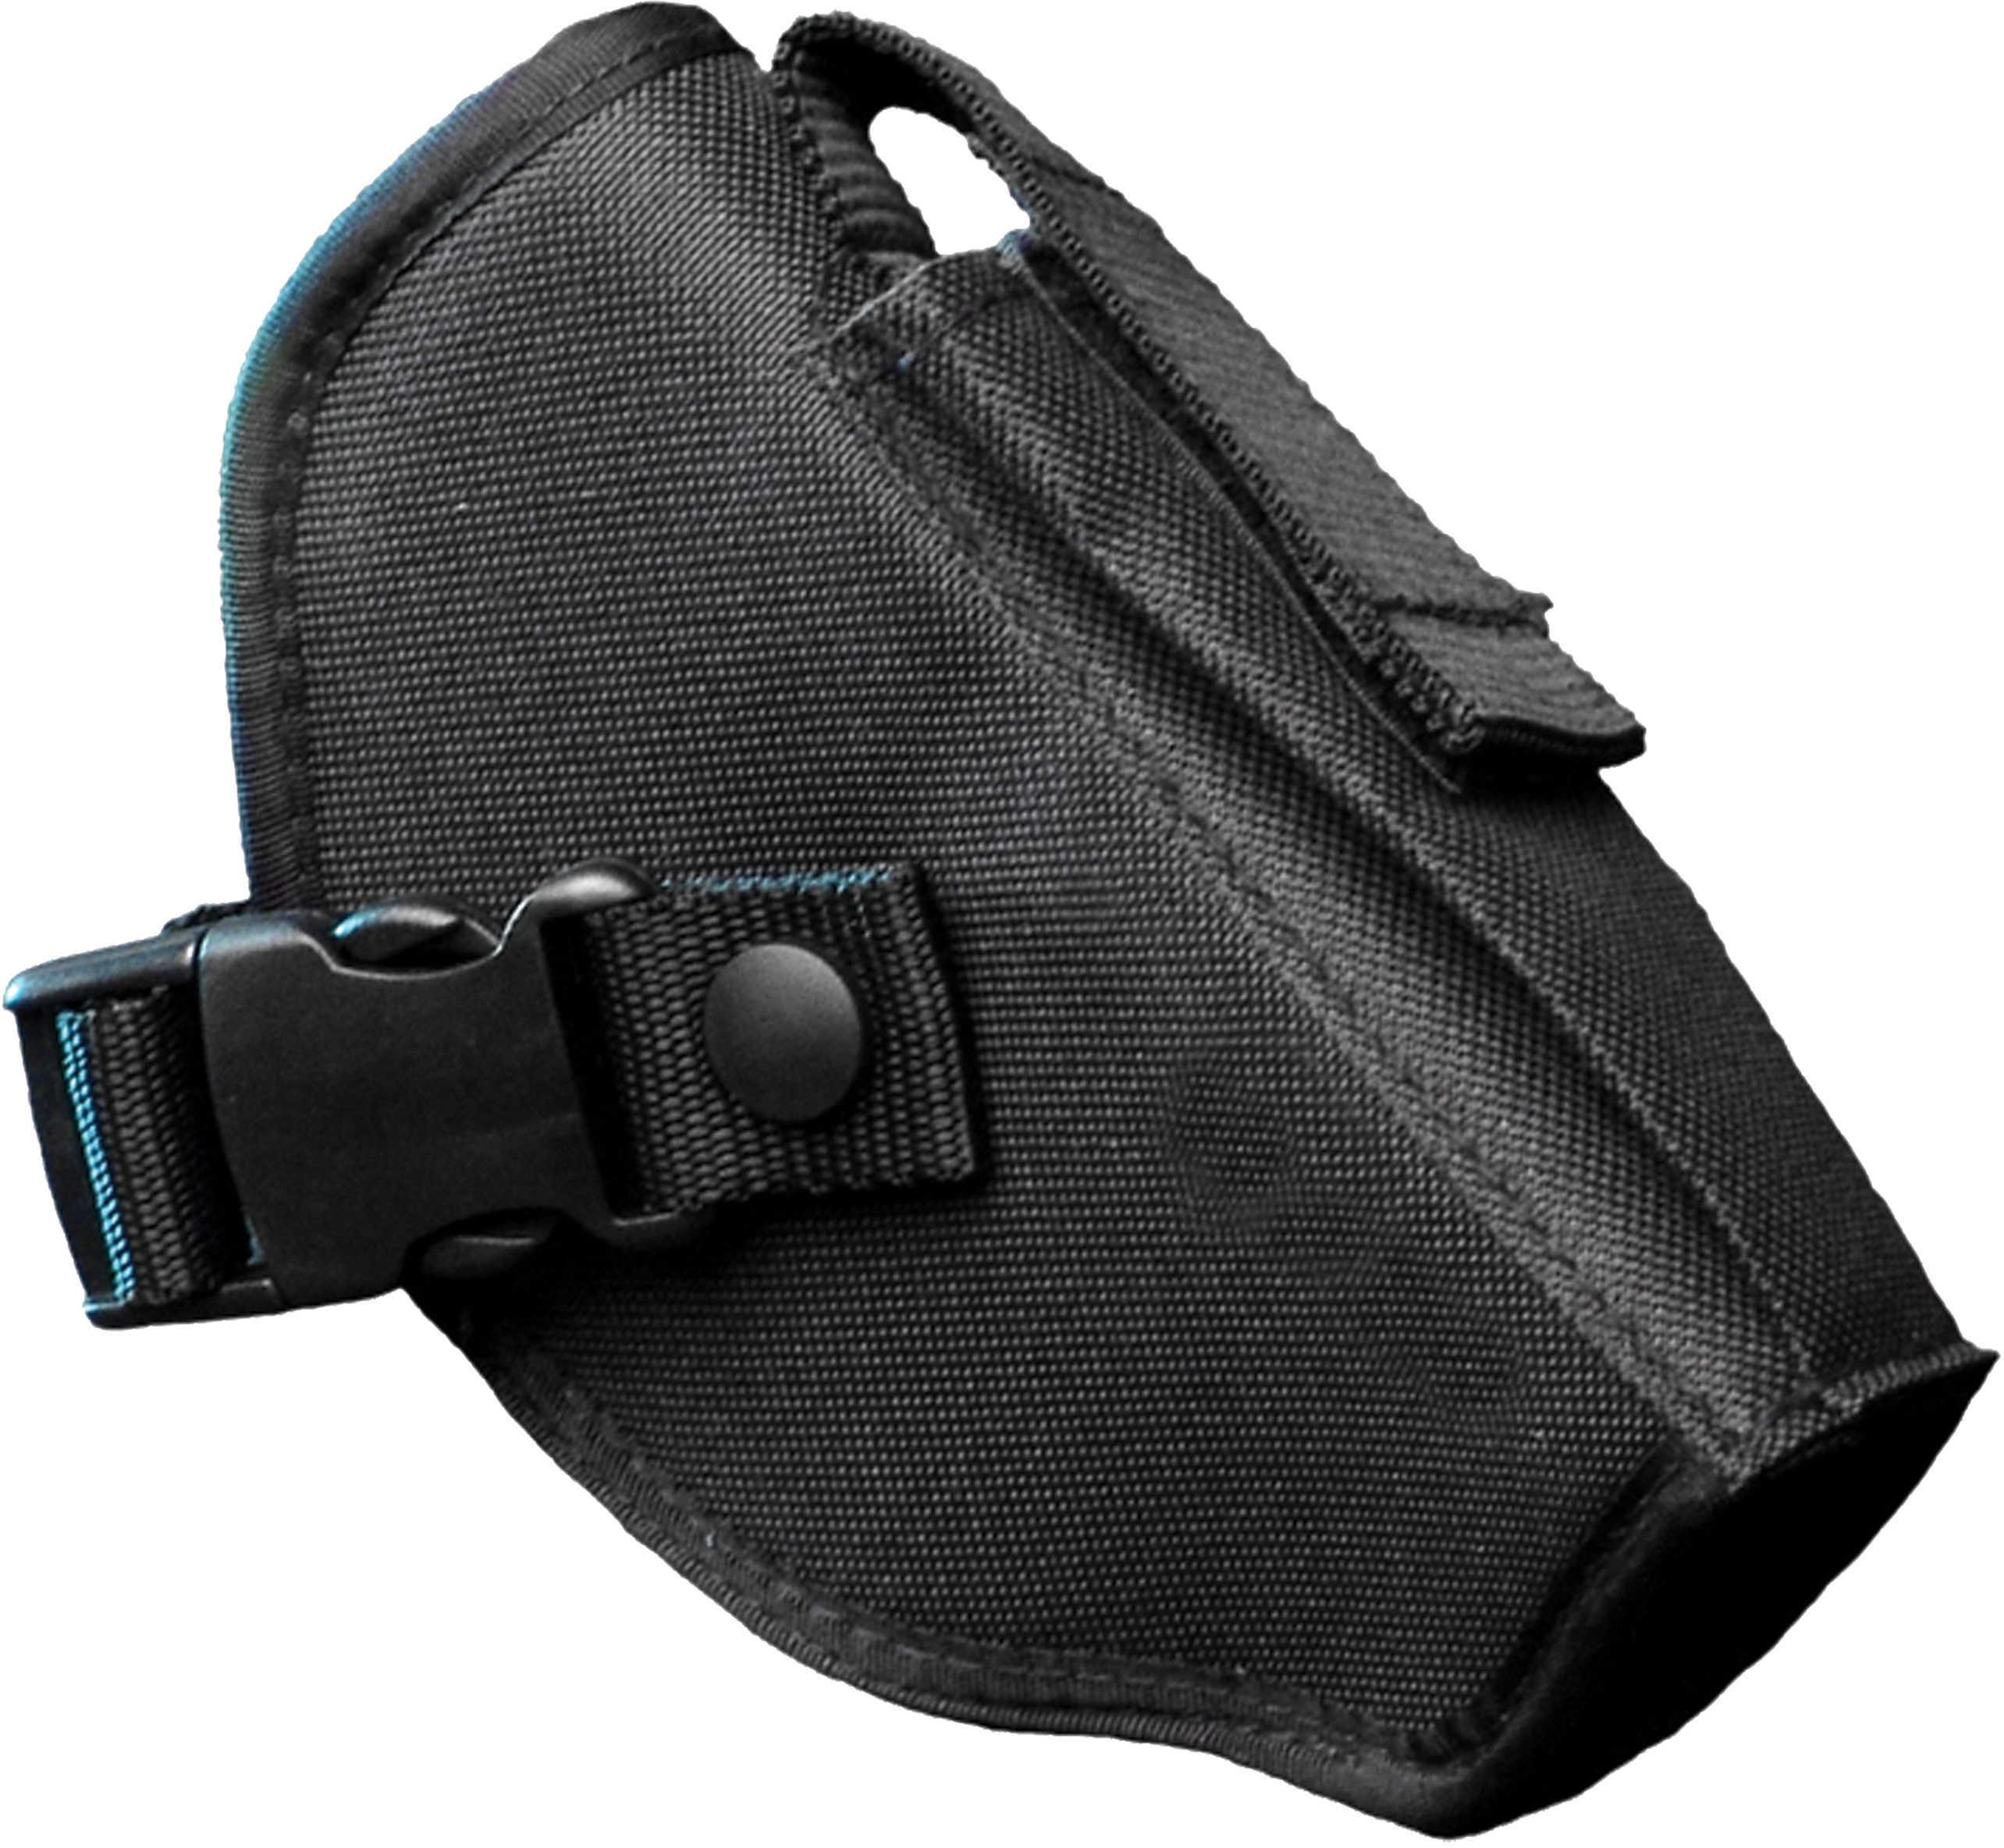 Crossman Soft Air Holster With Velcro Md: SAH02